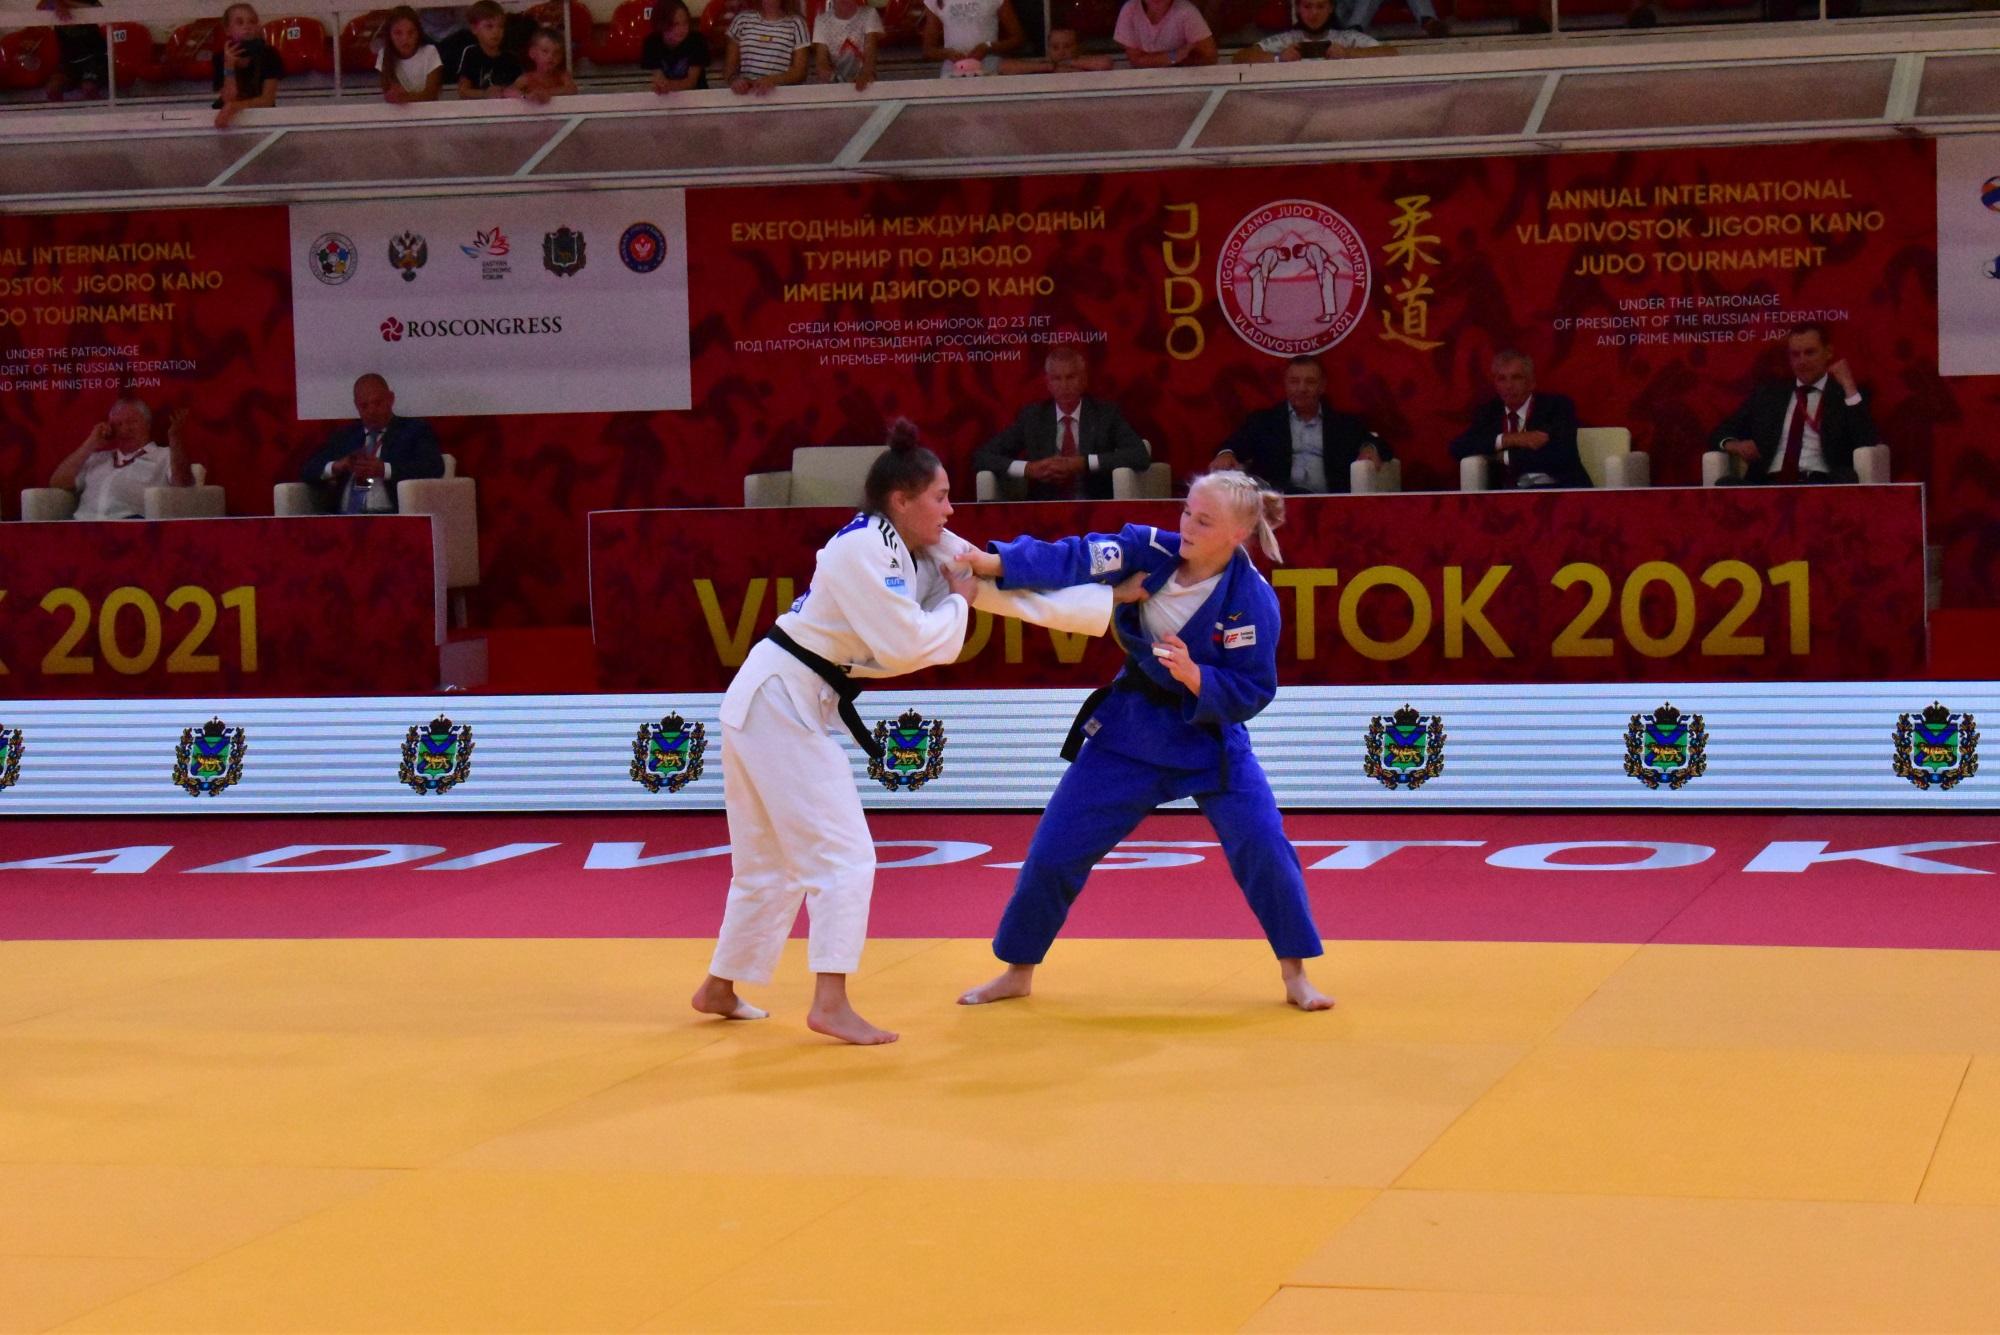 Дзюдо дзигиро кано judo kano Olympics Tokyo 2020 paris 2024